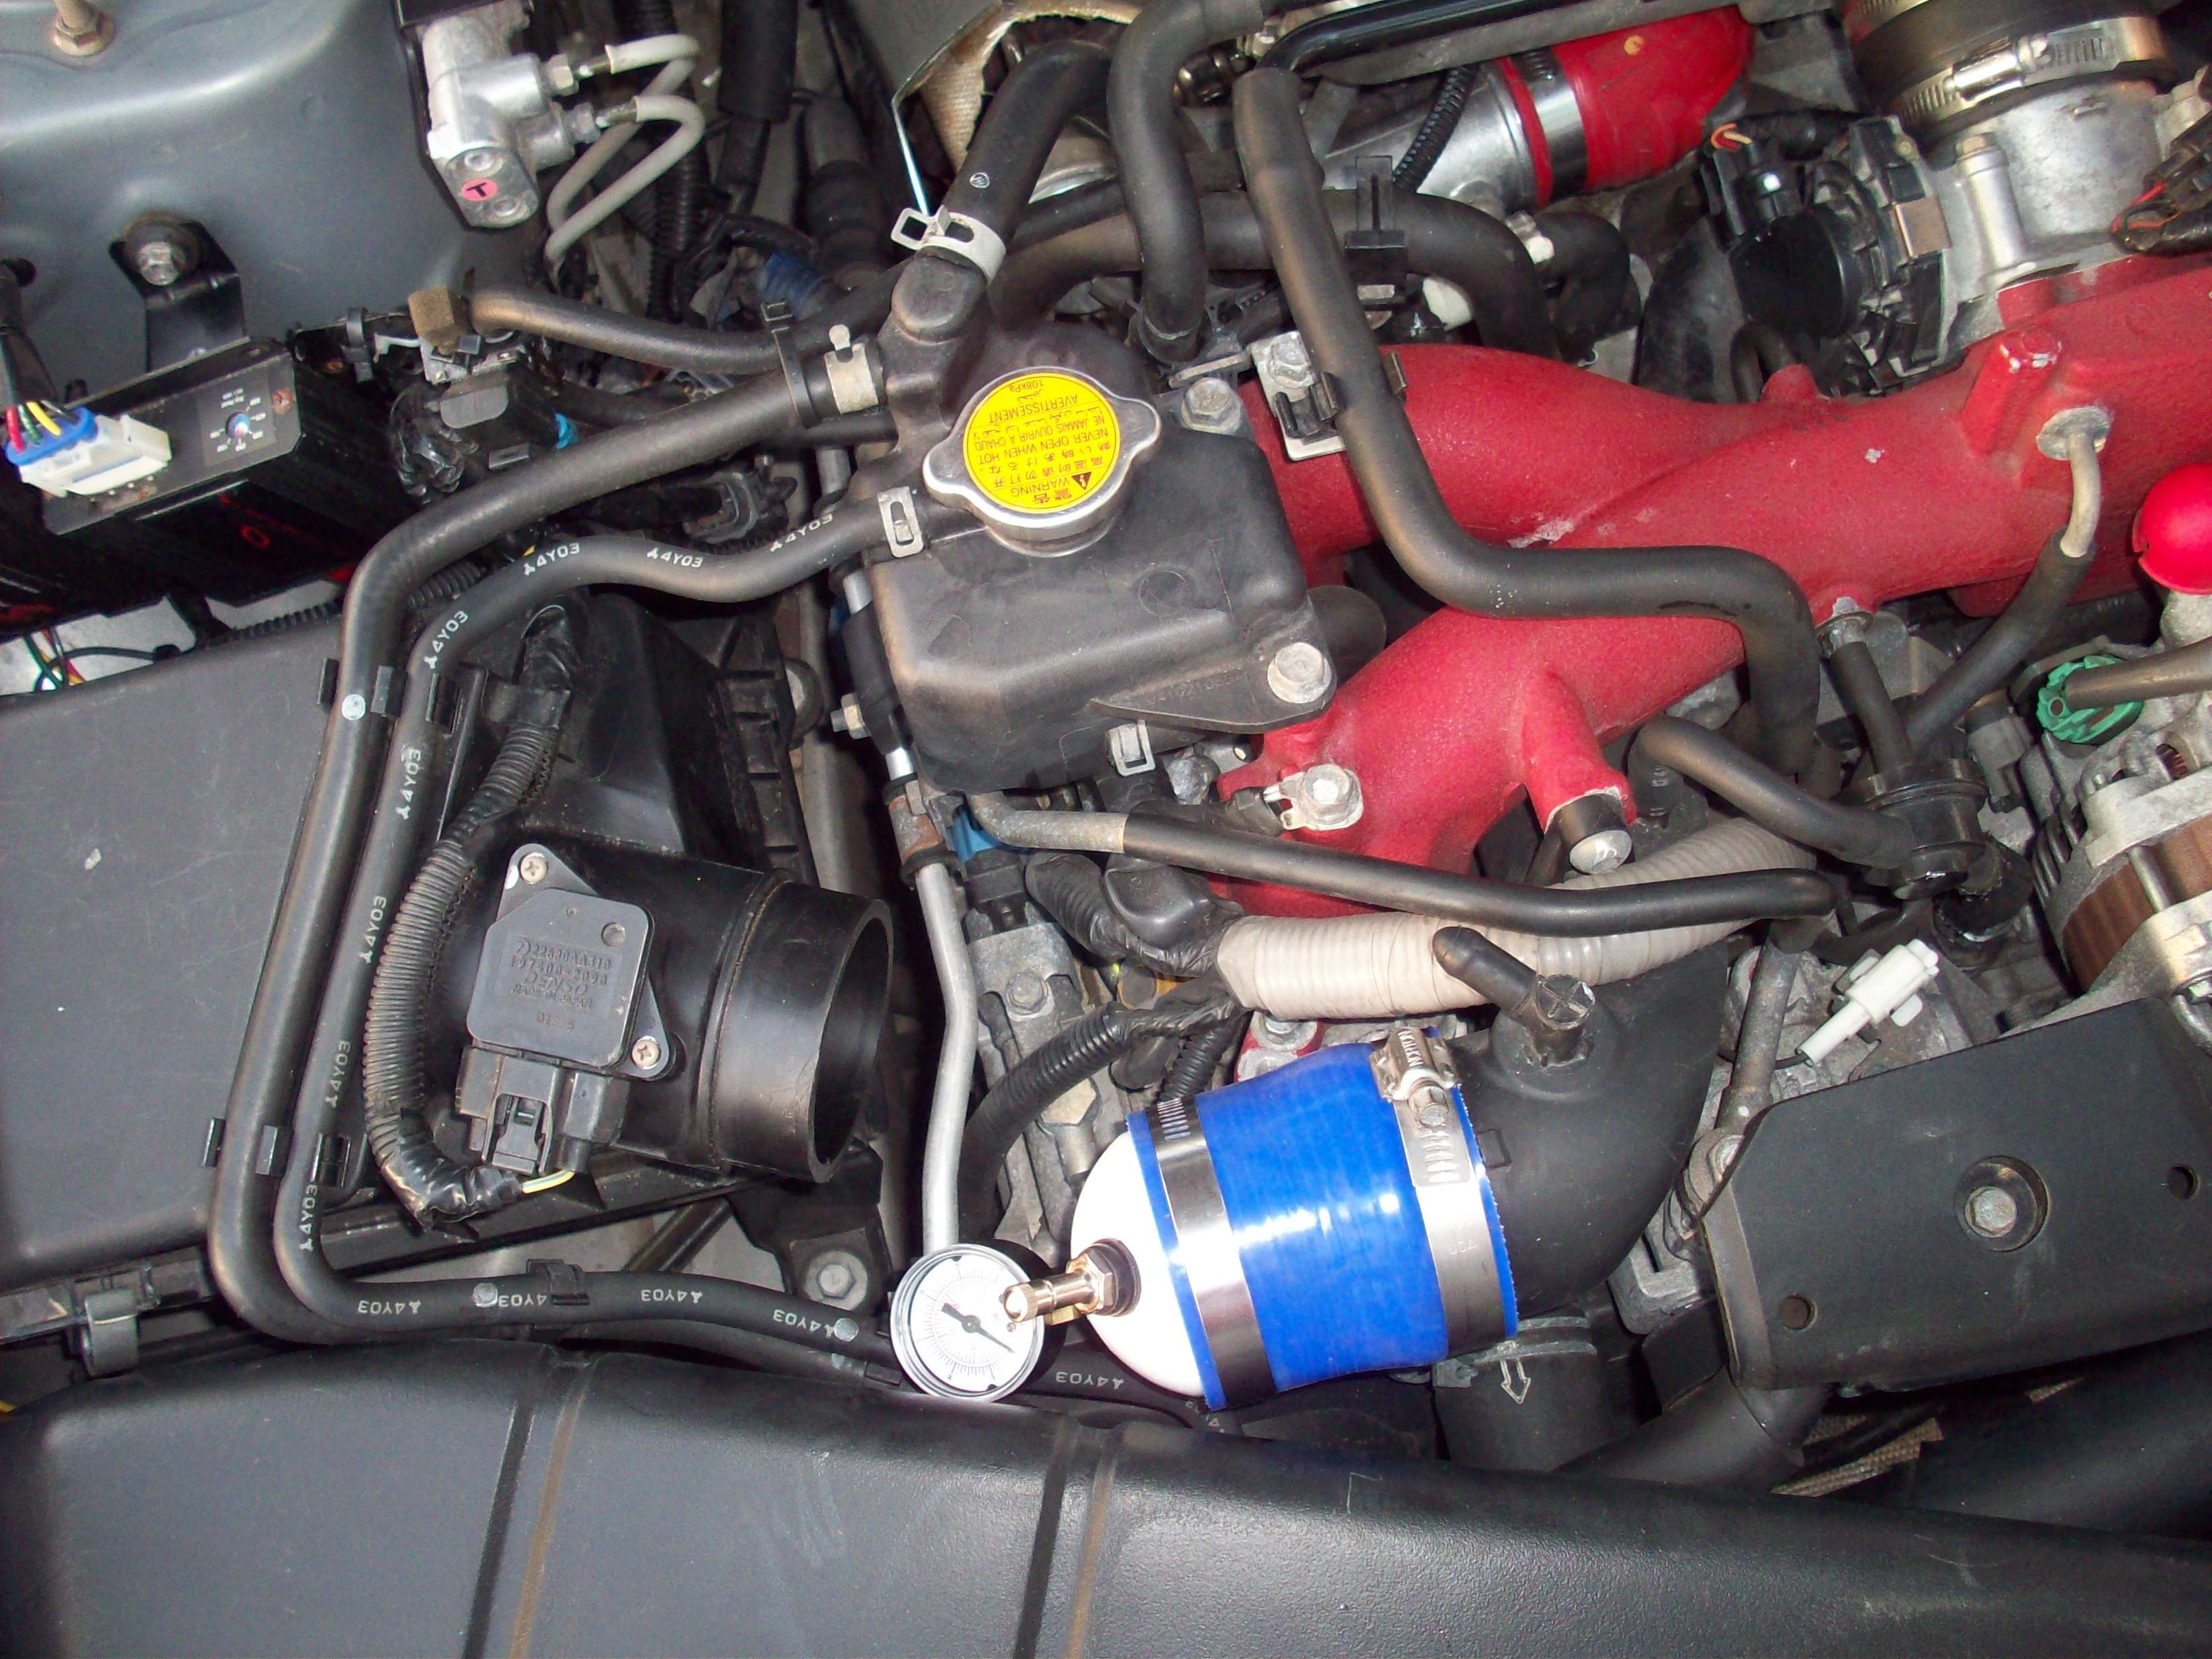 Wiring Diagrams 2002 Subaru Wrx How To Boostleak Test A Subaru